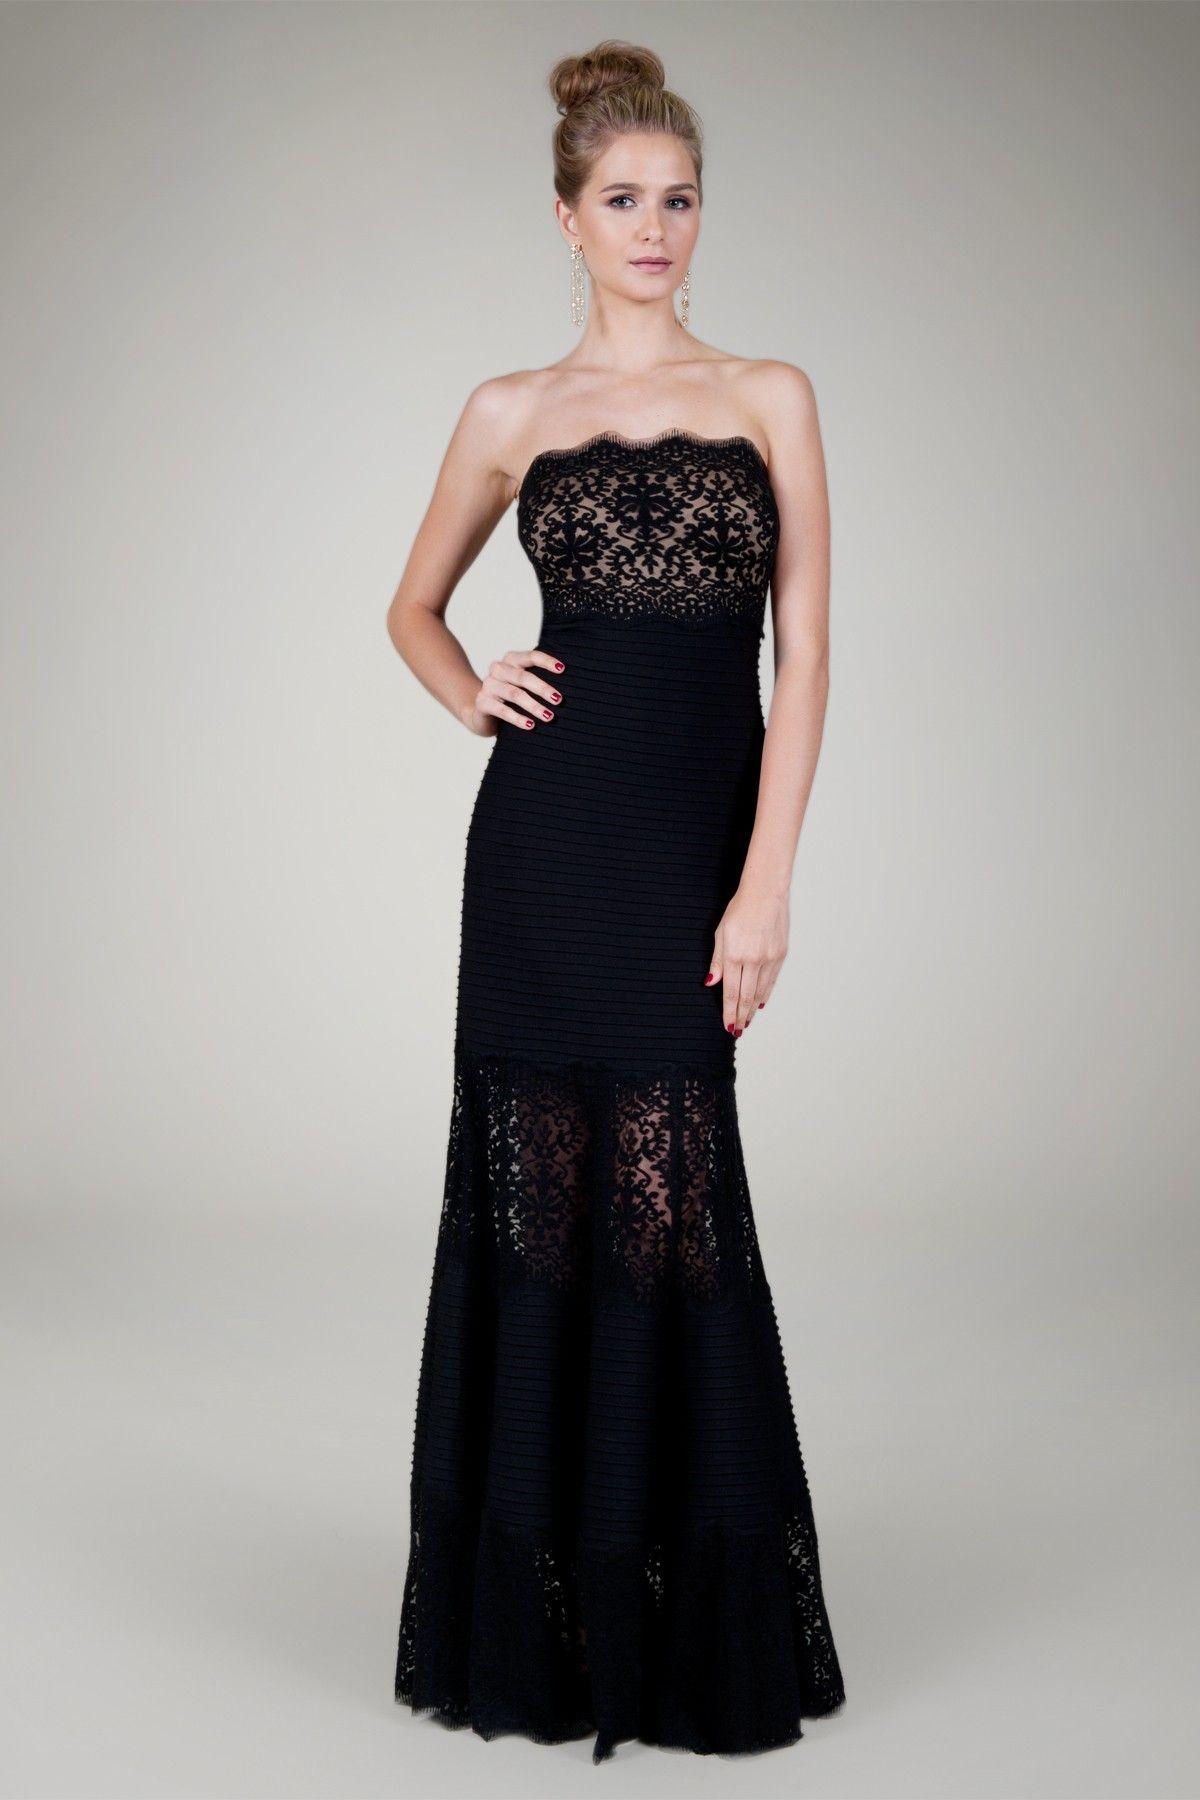 Tadashishoji Black Tie Party Dress Formal Dresses Gowns Strapless Dress Formal